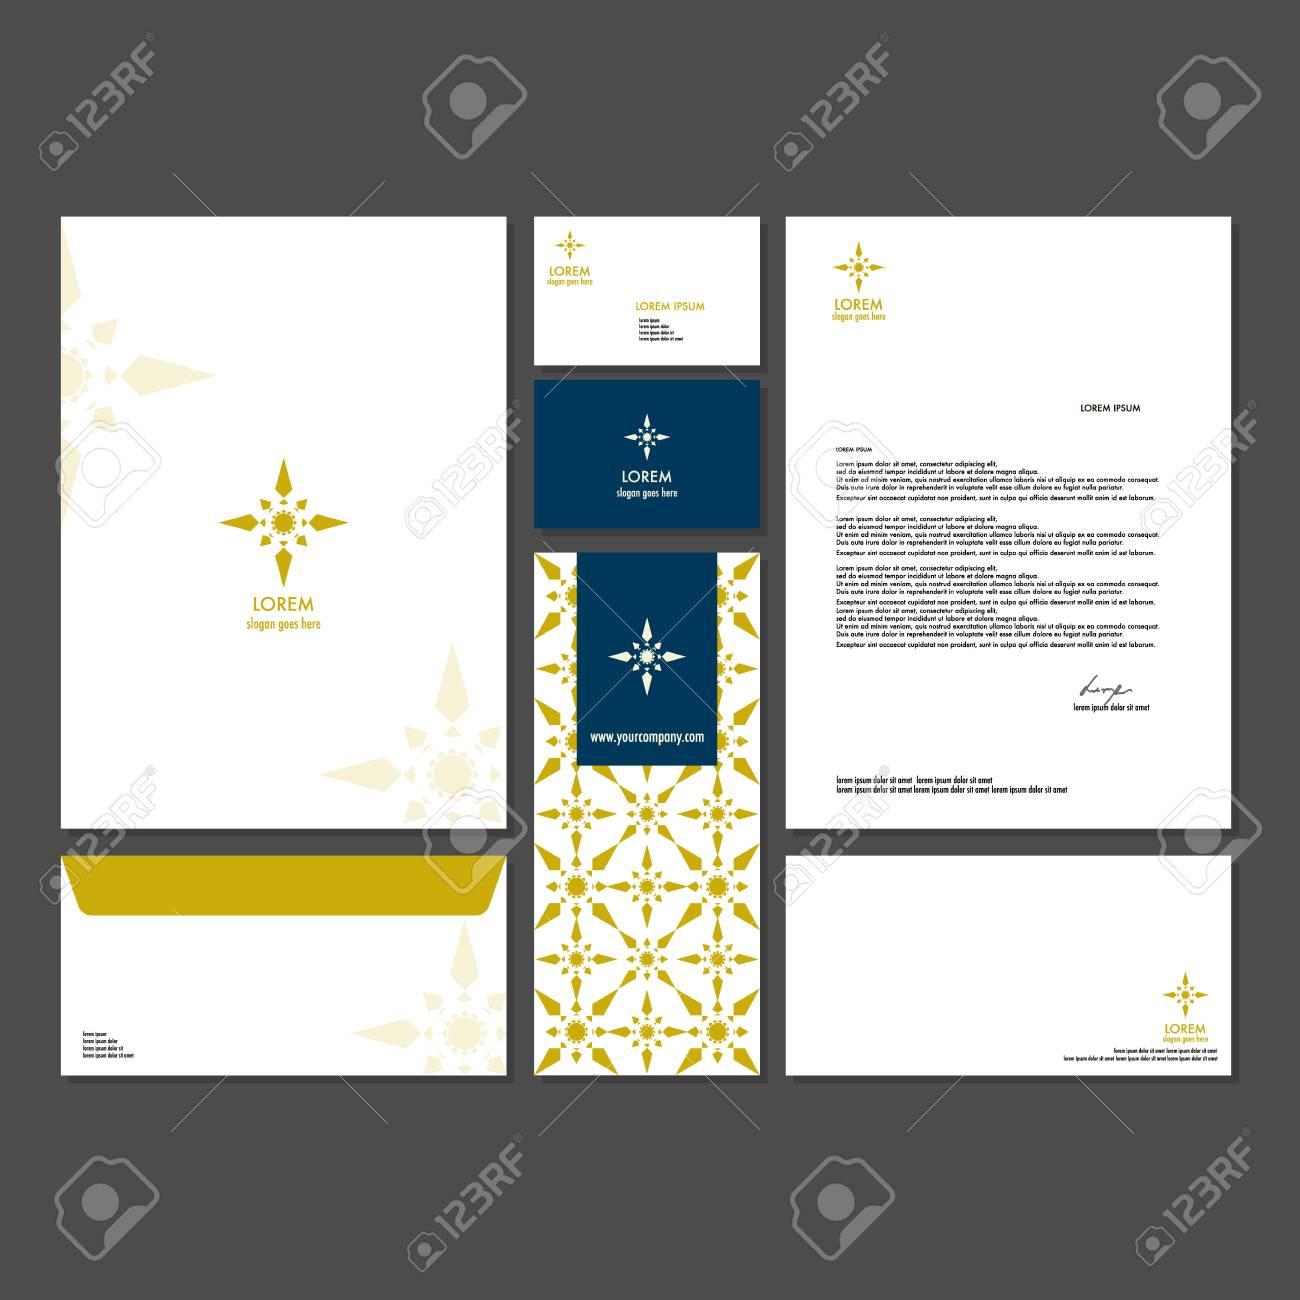 Design Corporate Ideny   Template Design Corporate Identity Branding Unternehmen Set